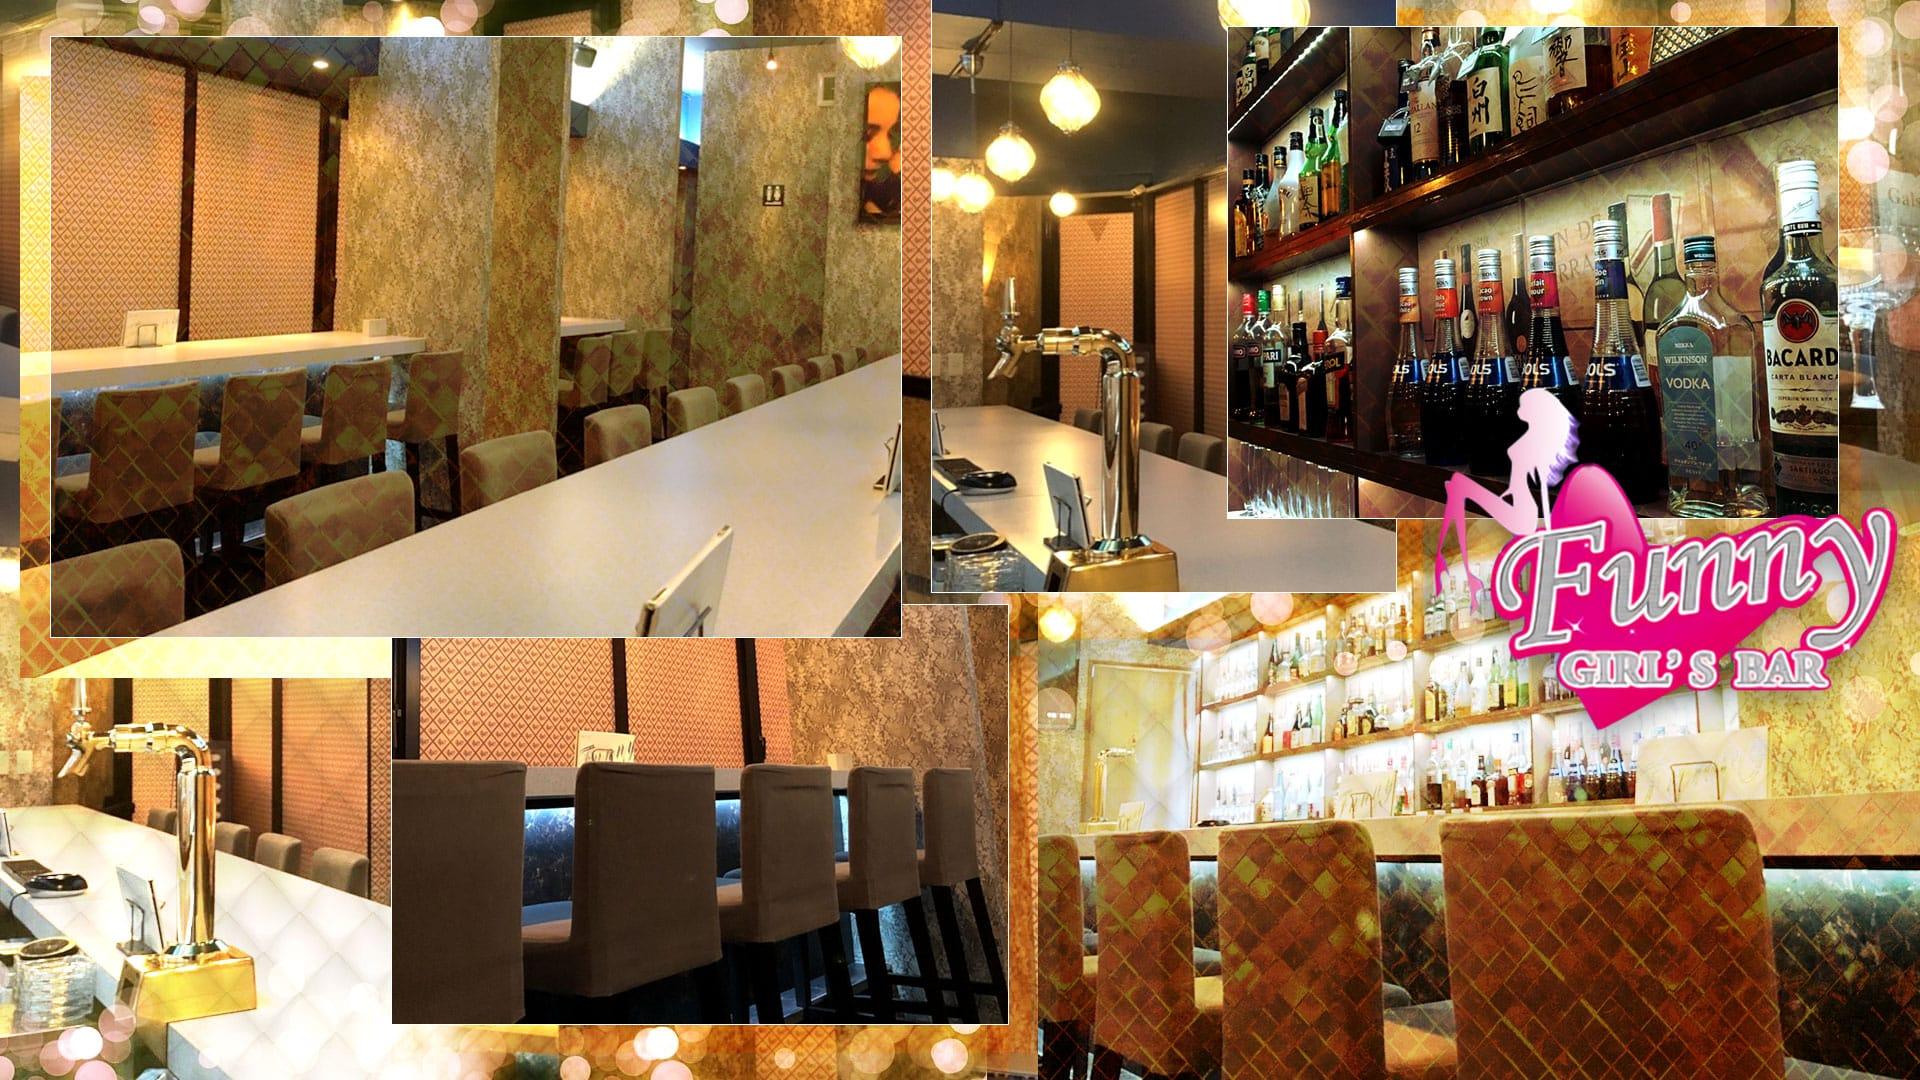 Girl's Bar Funny 上野店<ファニー> 上野 ガールズバー TOP画像